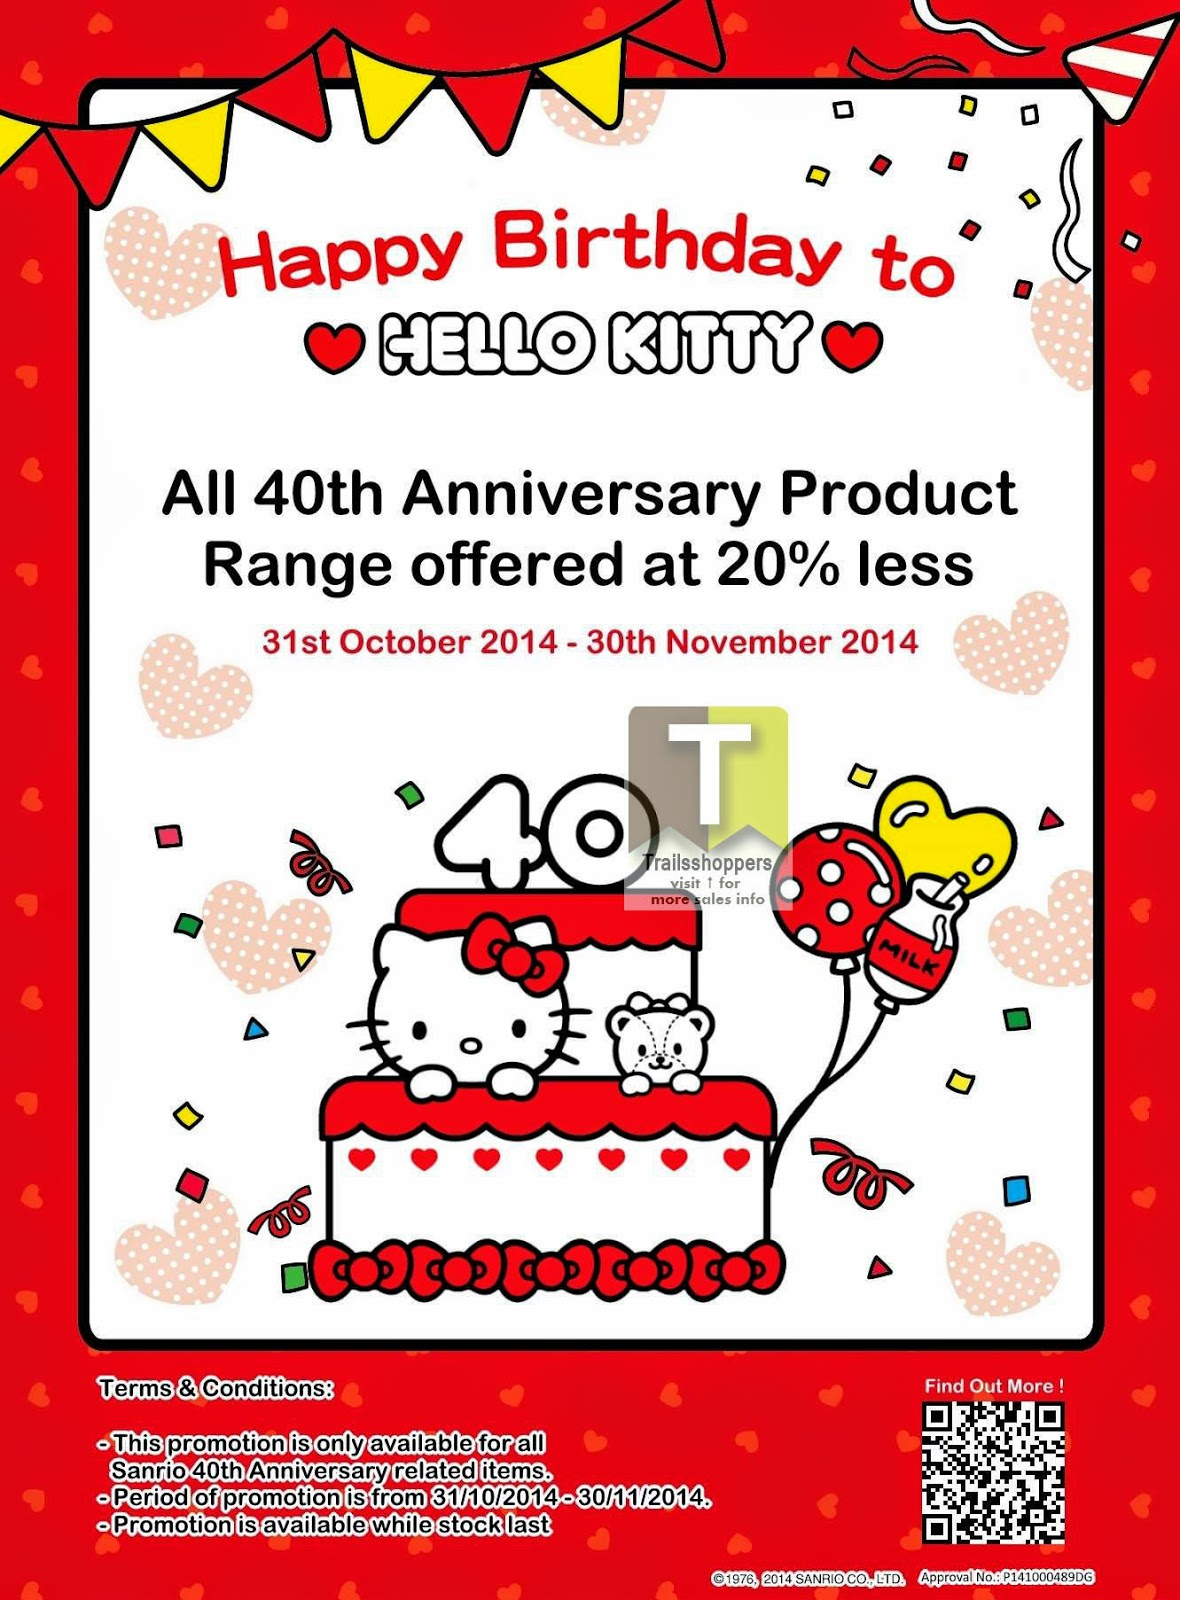 Sanrio Gift Gate Malaysia Hello Kitty 40th Promo